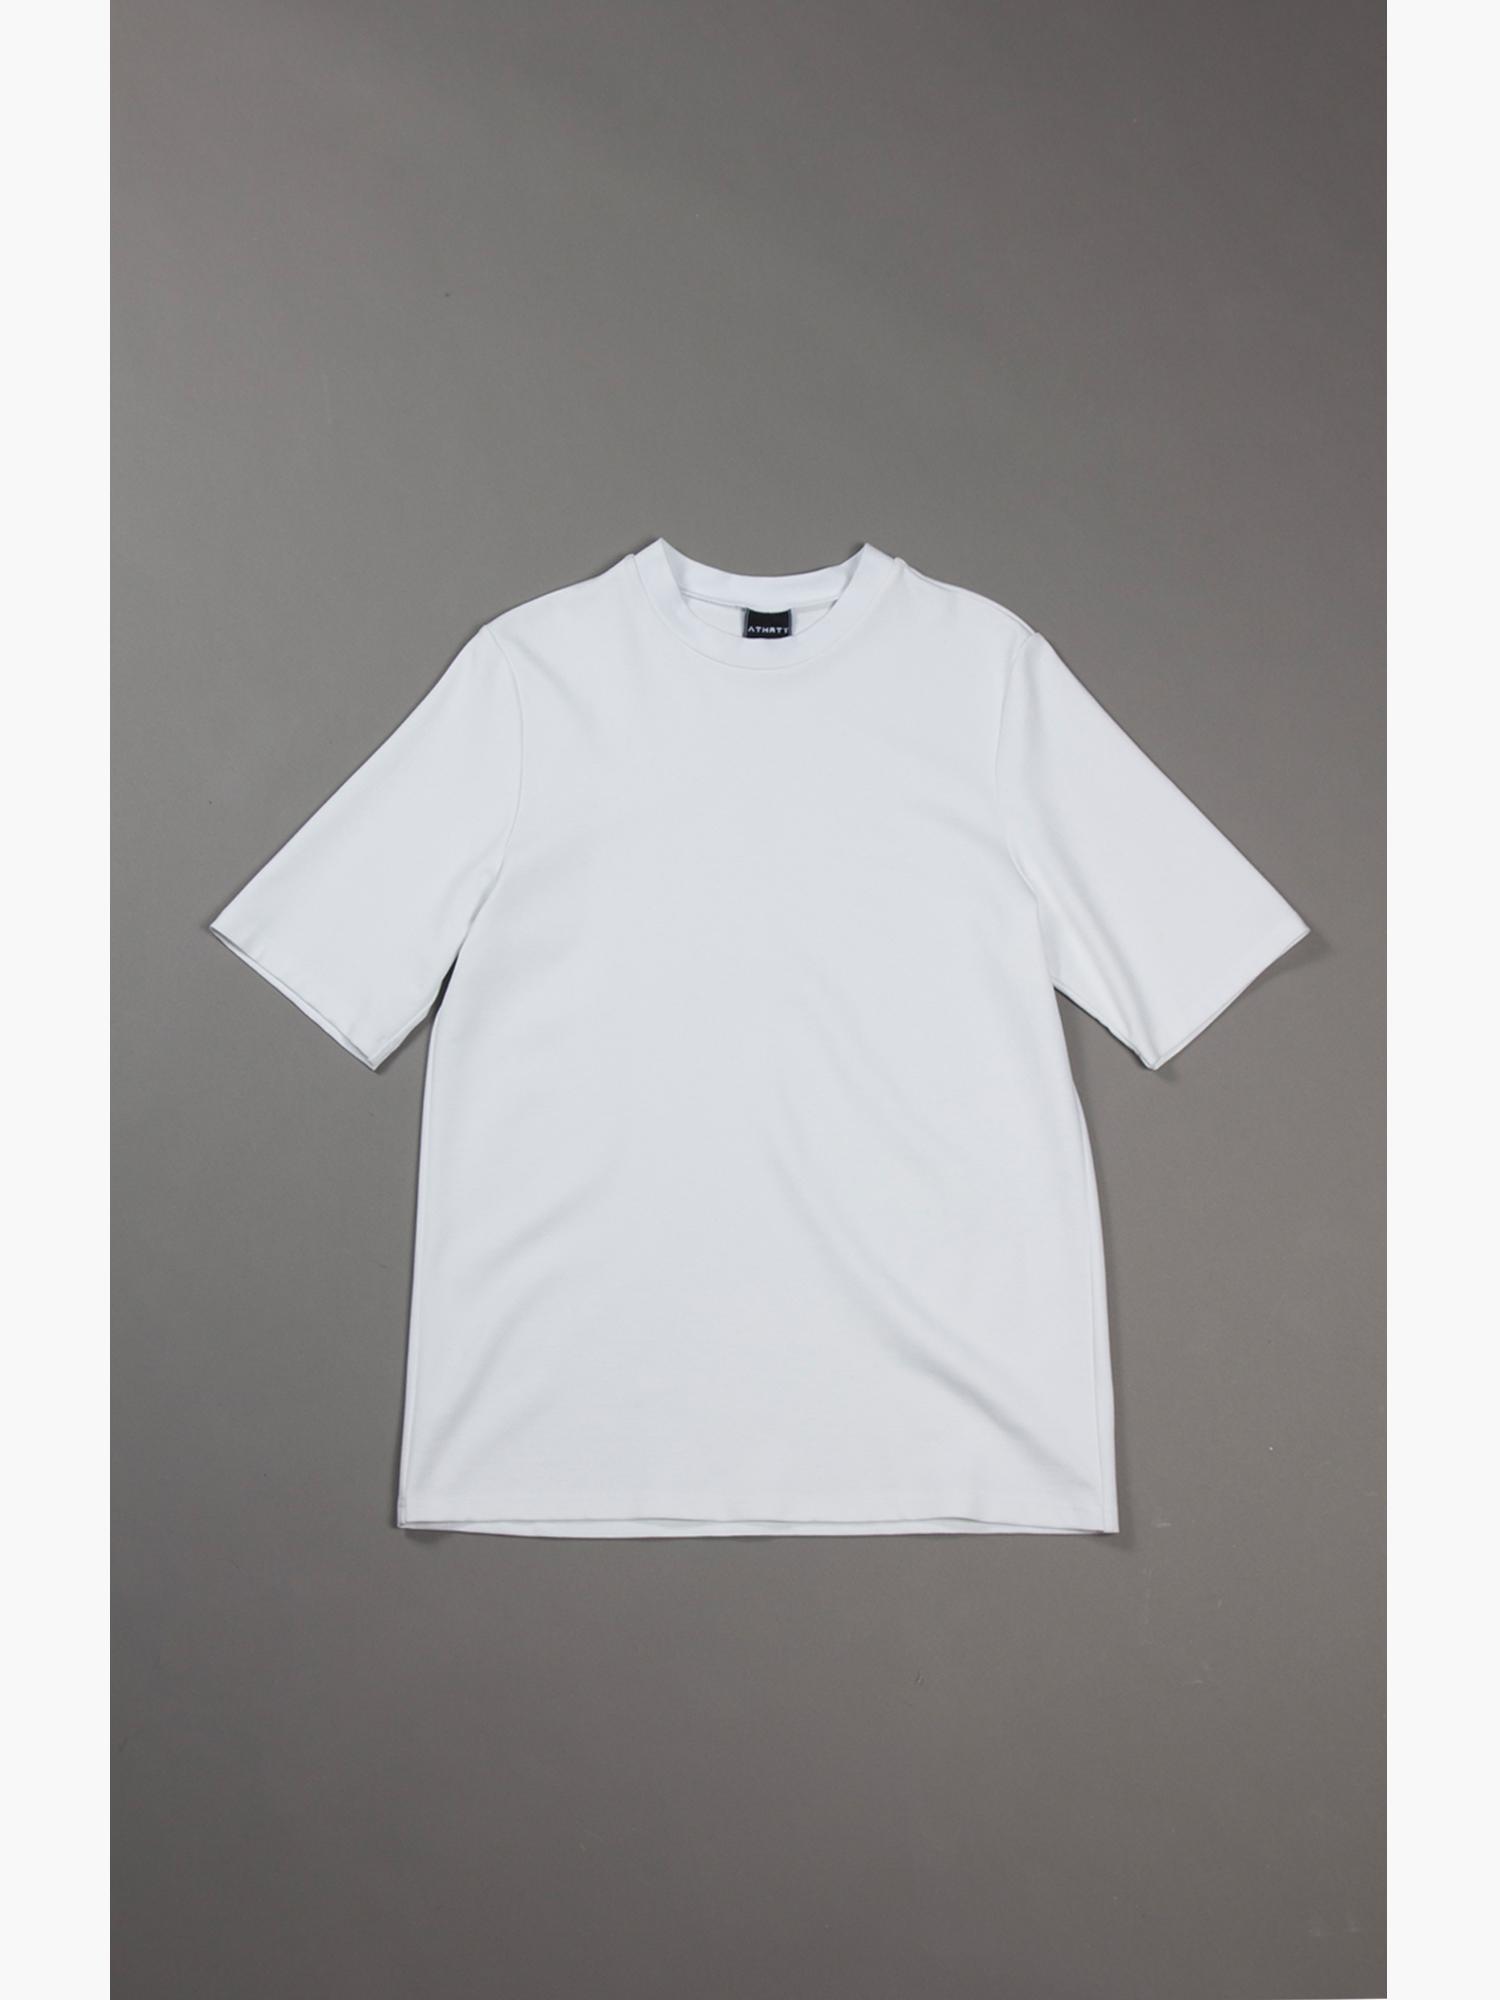 ATHRTY_thurs_t-shirt_white_f1